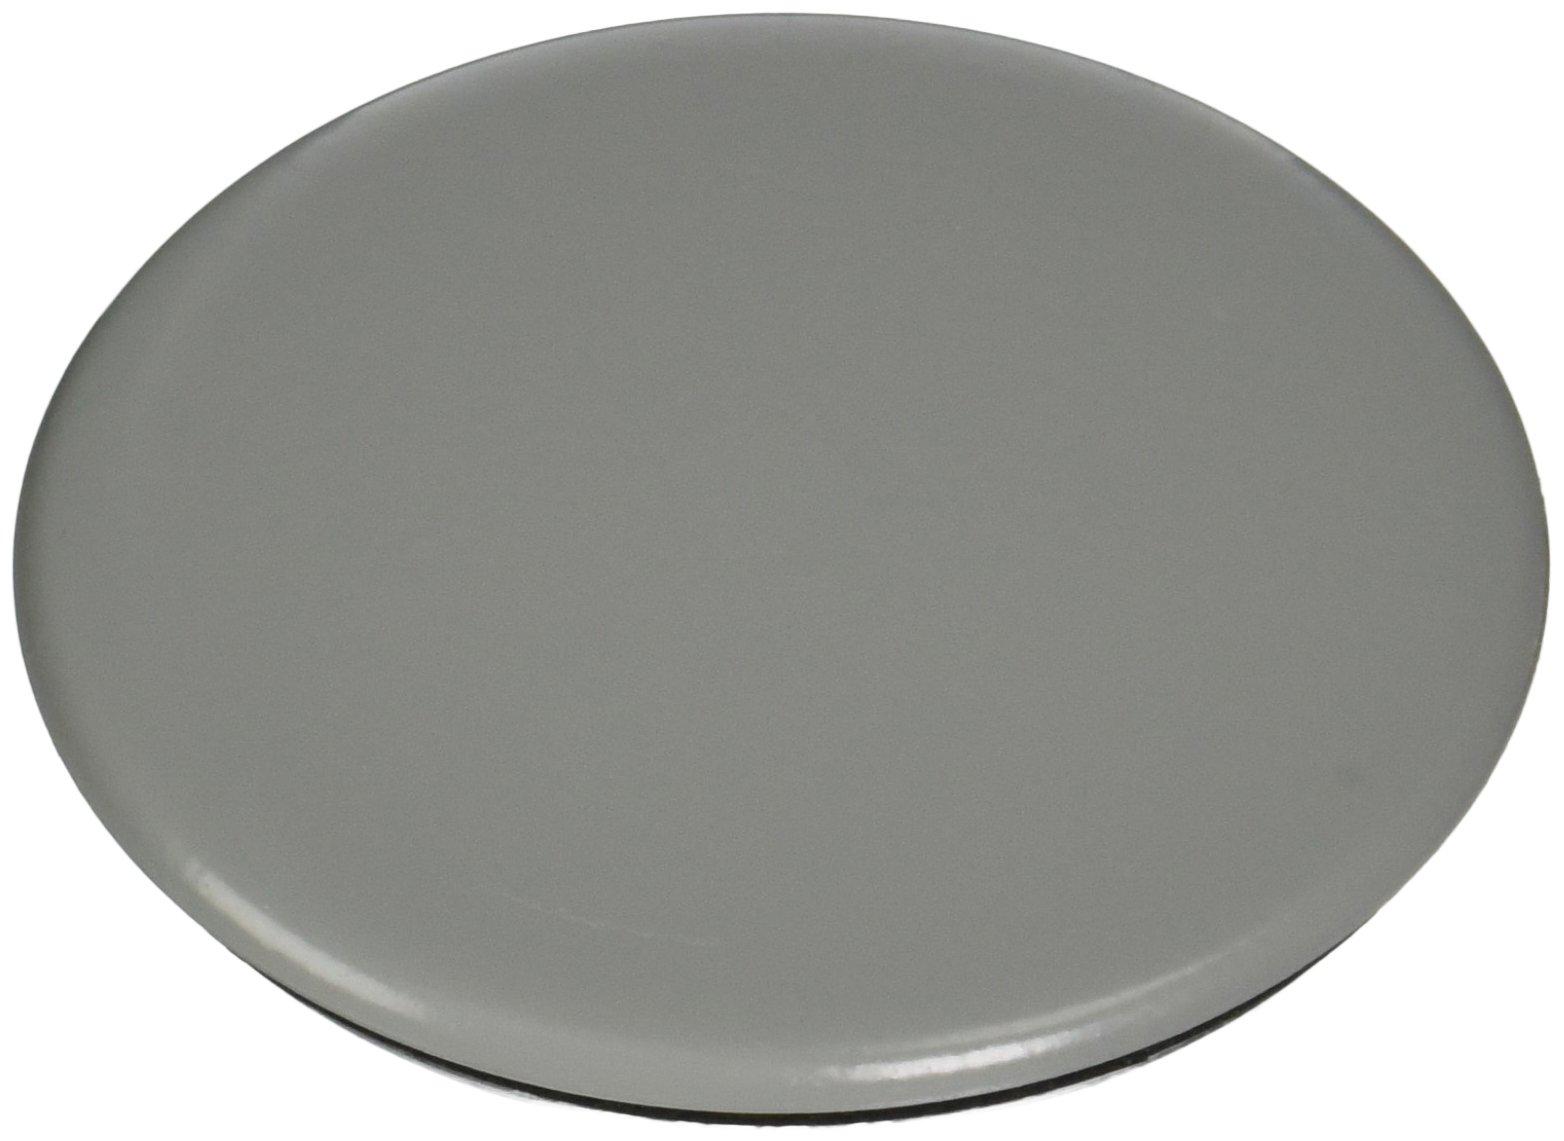 Hoffman AS200 Hole Seal for 2'' Conduit, Steel, 3.00'' Diameter, Gray